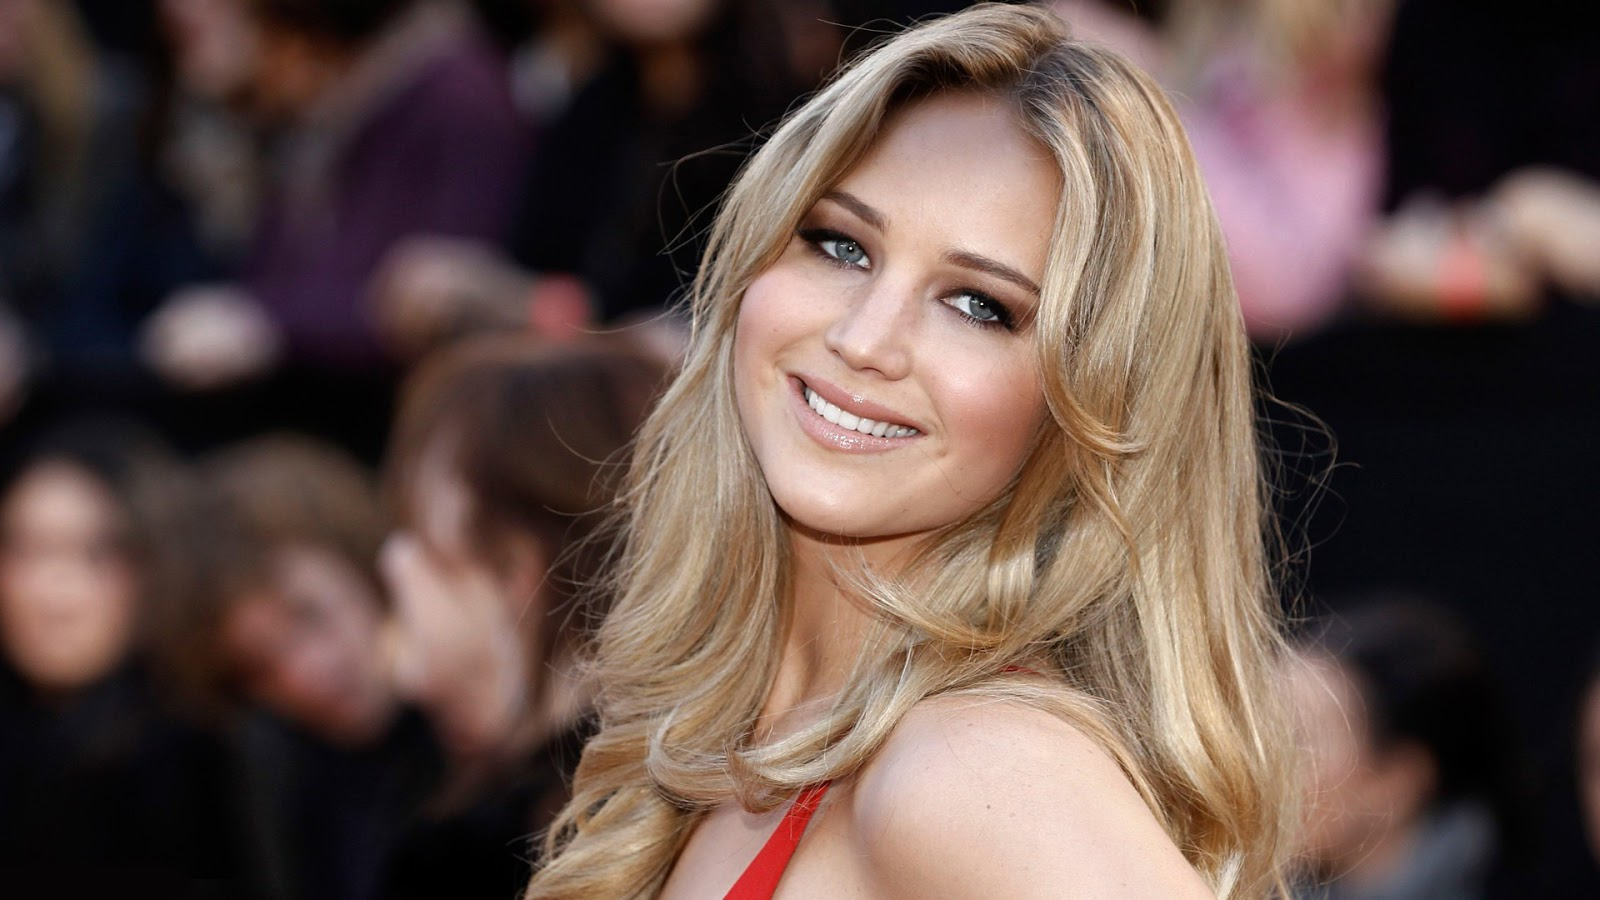 Jennifer Lawrence Hot Hd Photos  Wallpaper - Hd Images -3565